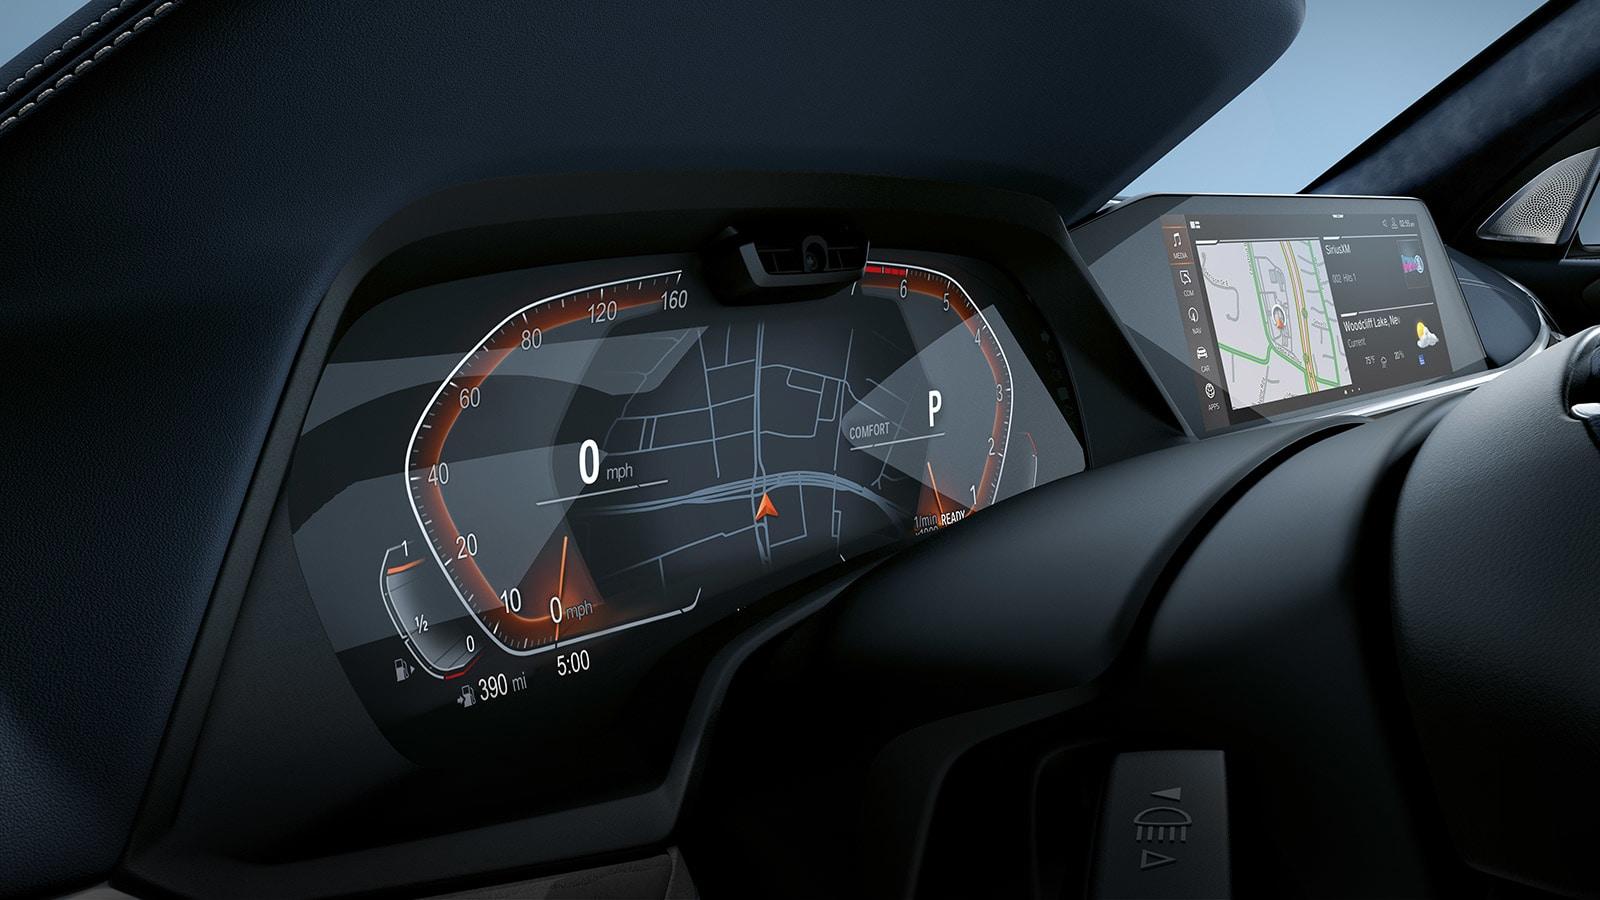 2019 BMW X7 Instrument Panel